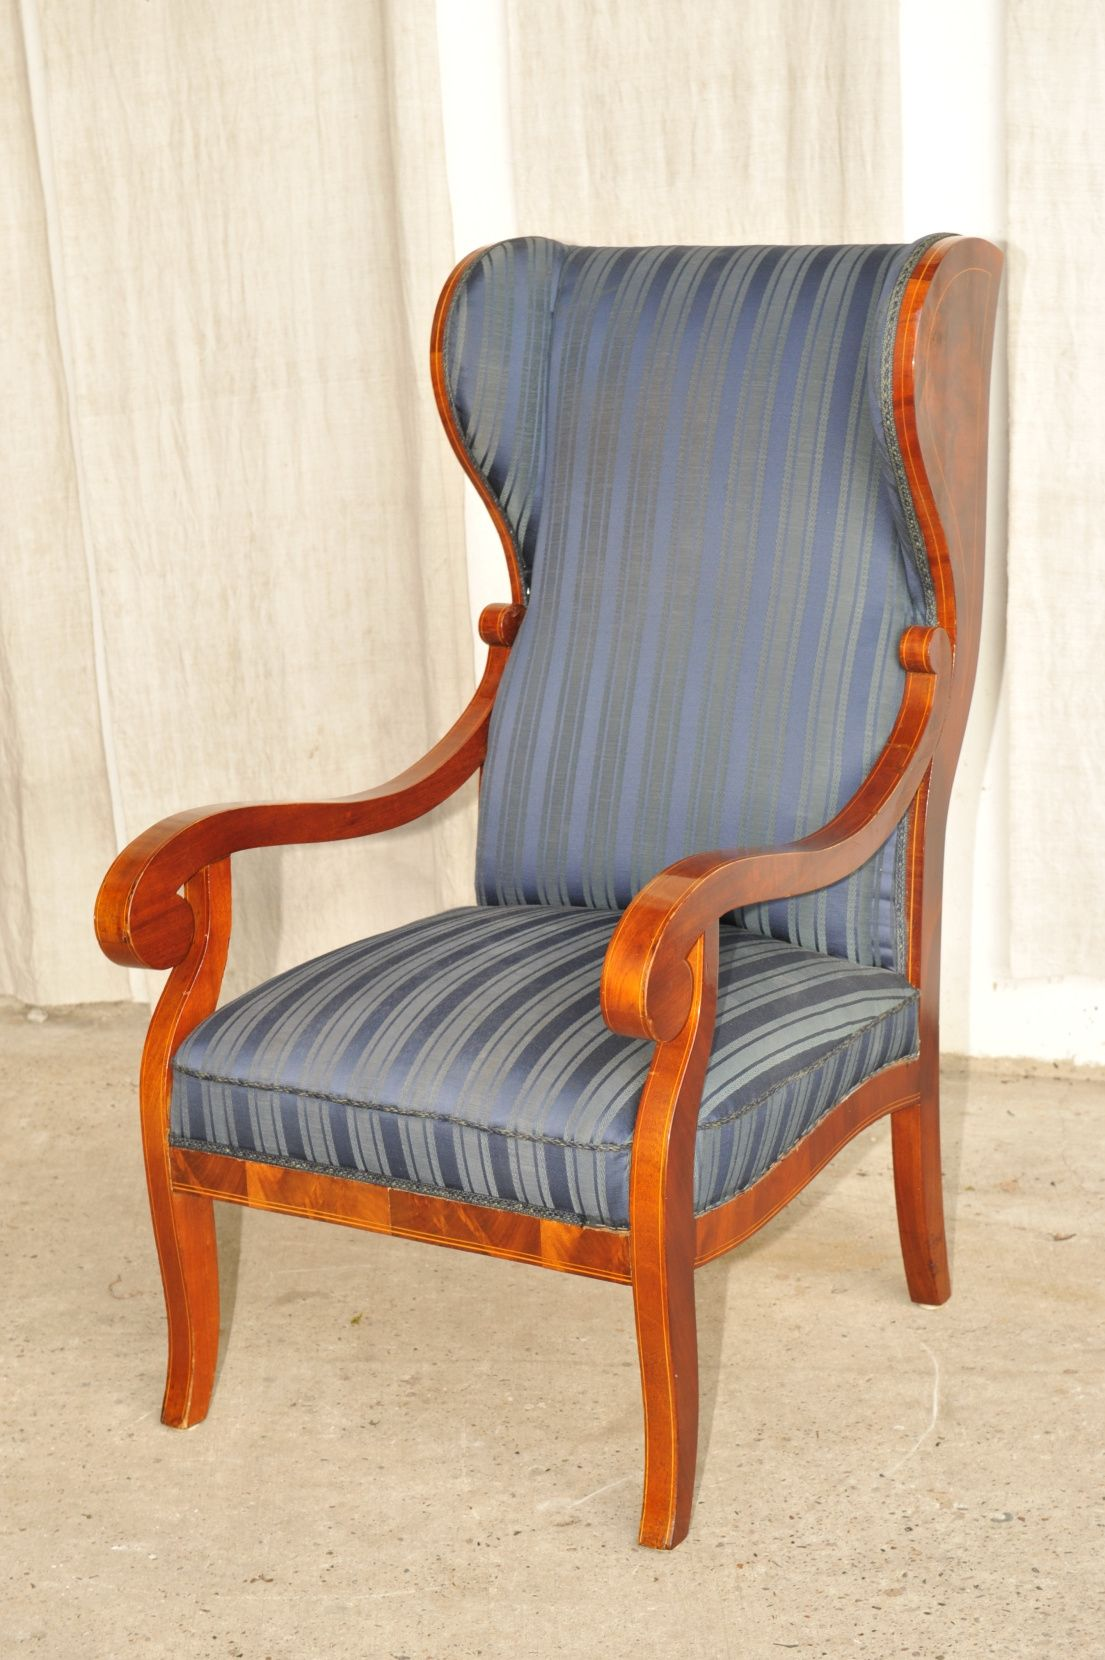 biedermeier ohrensessel mahagoni mit fadeneinlagen antik im hof ohrensessel pinterest. Black Bedroom Furniture Sets. Home Design Ideas